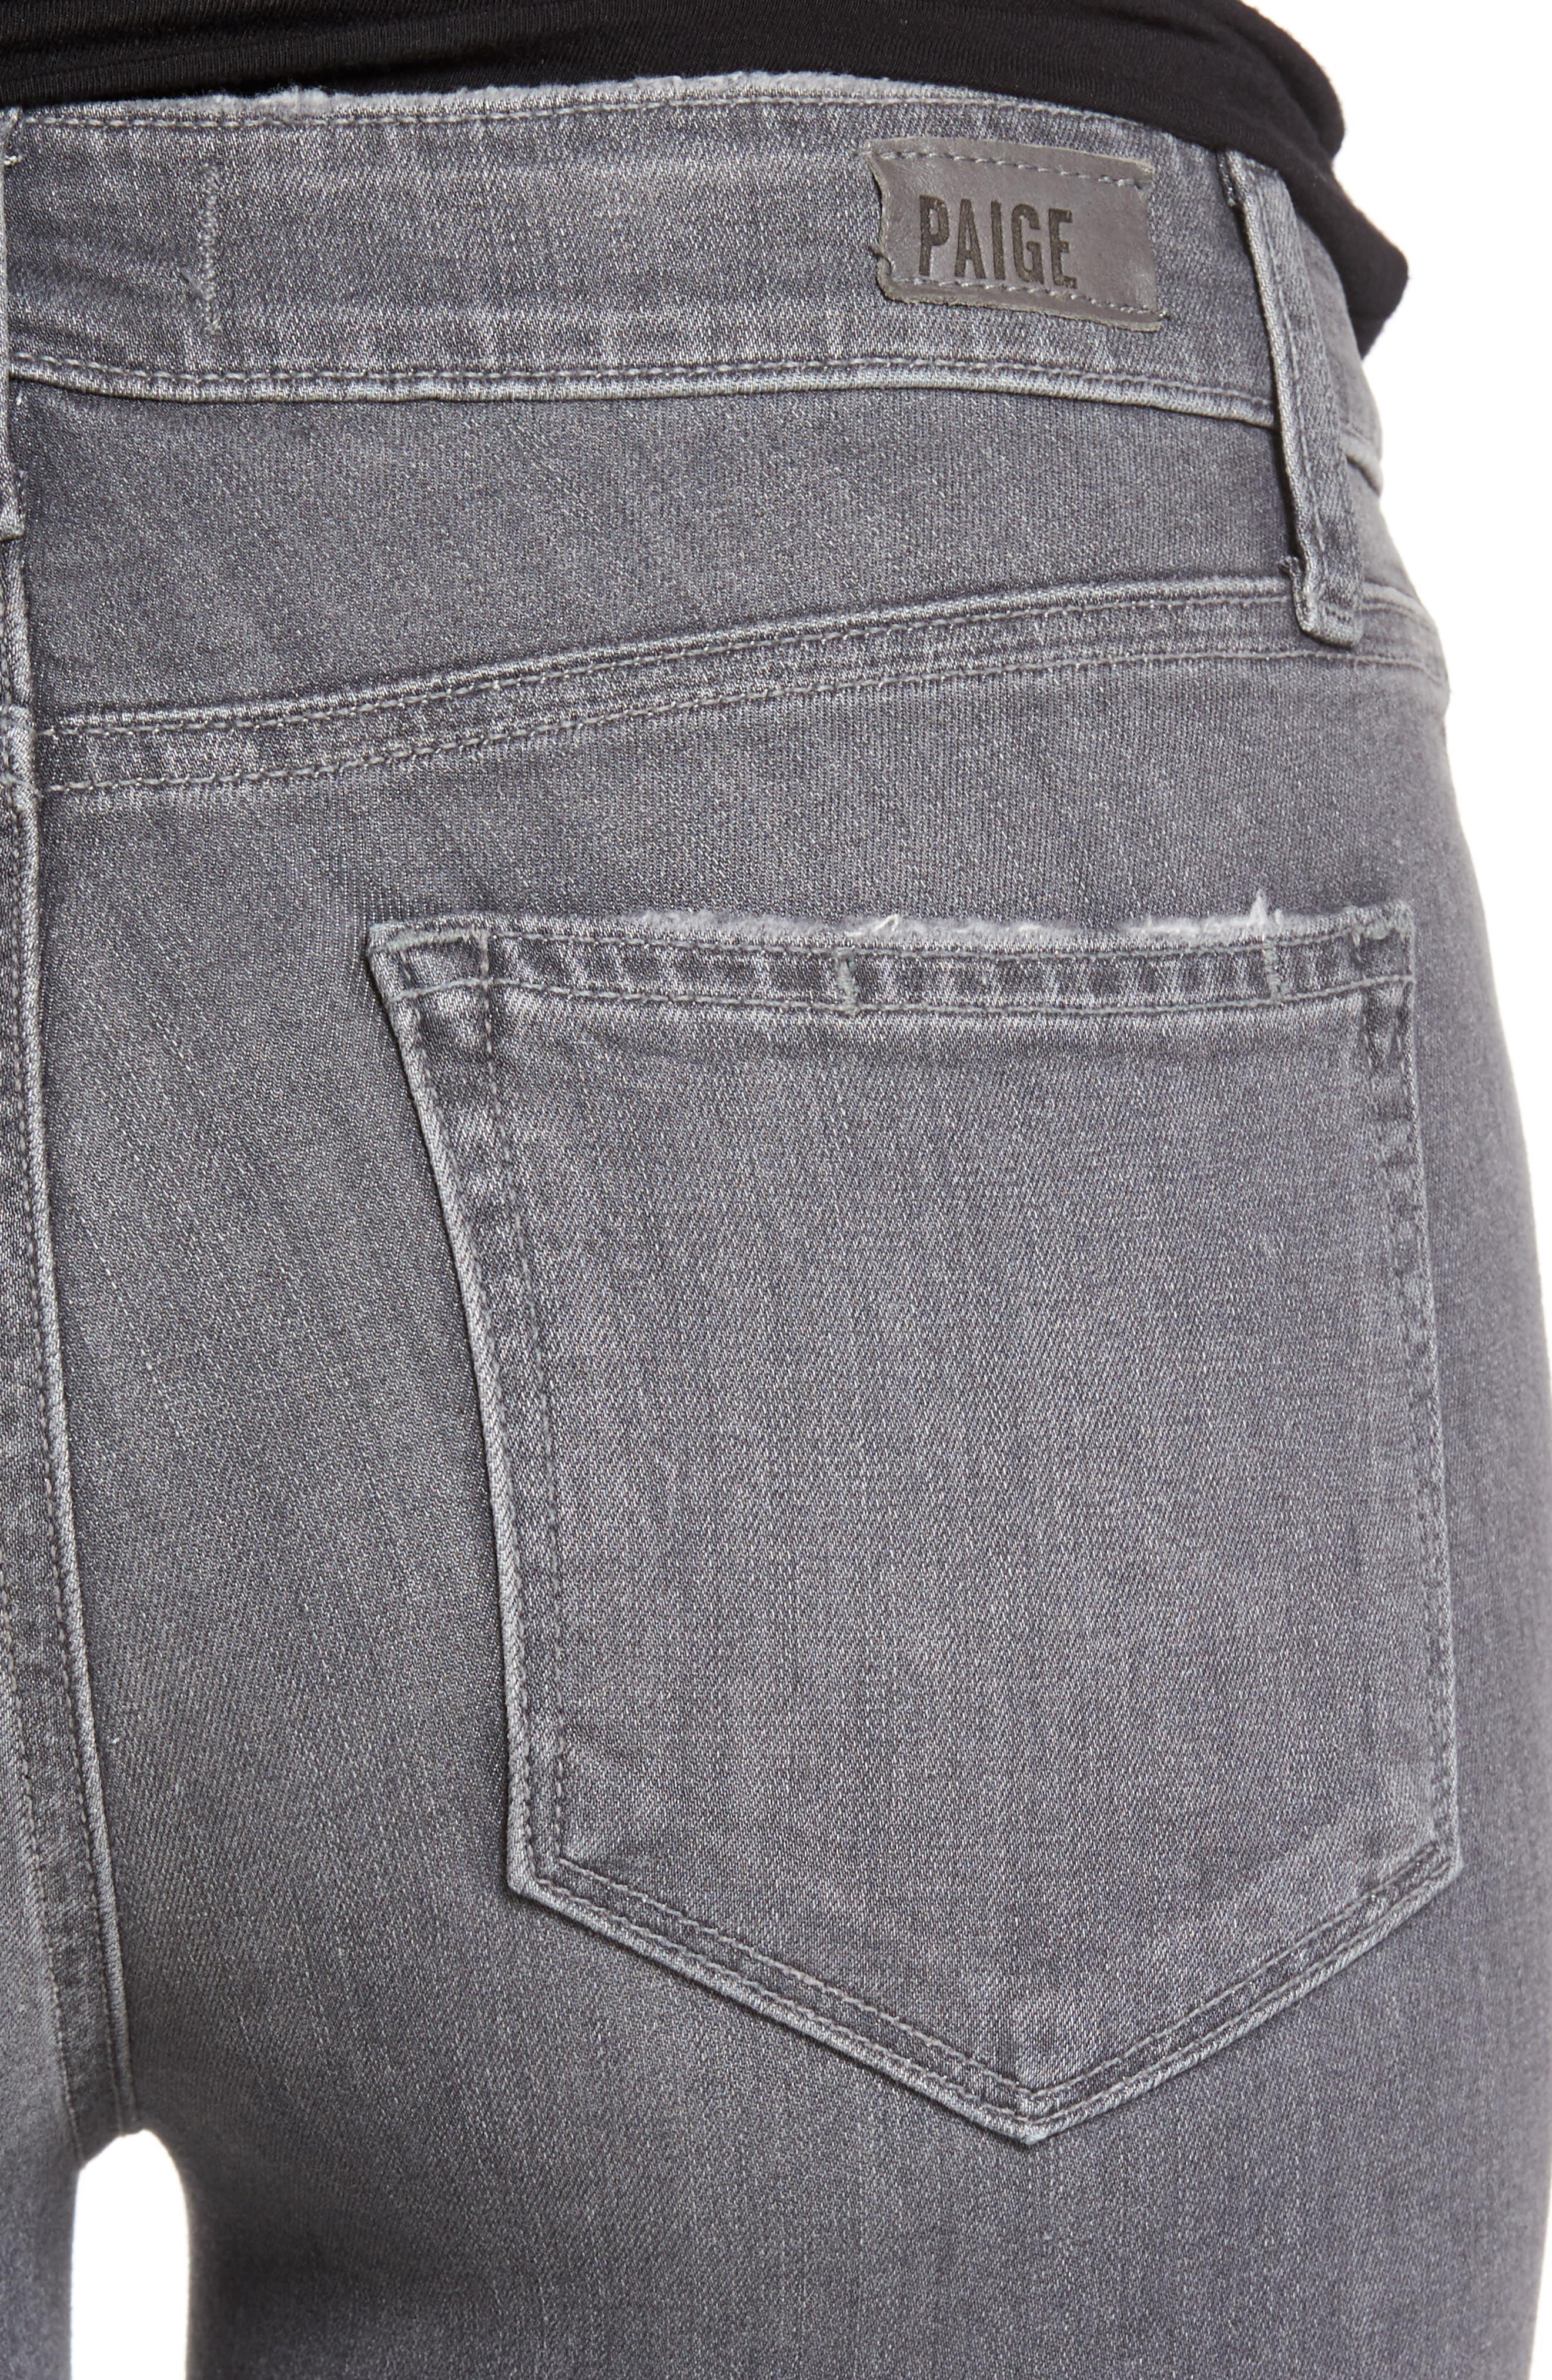 Verdugo Raw Hem Ankle Skinny Jeans,                             Alternate thumbnail 4, color,                             020